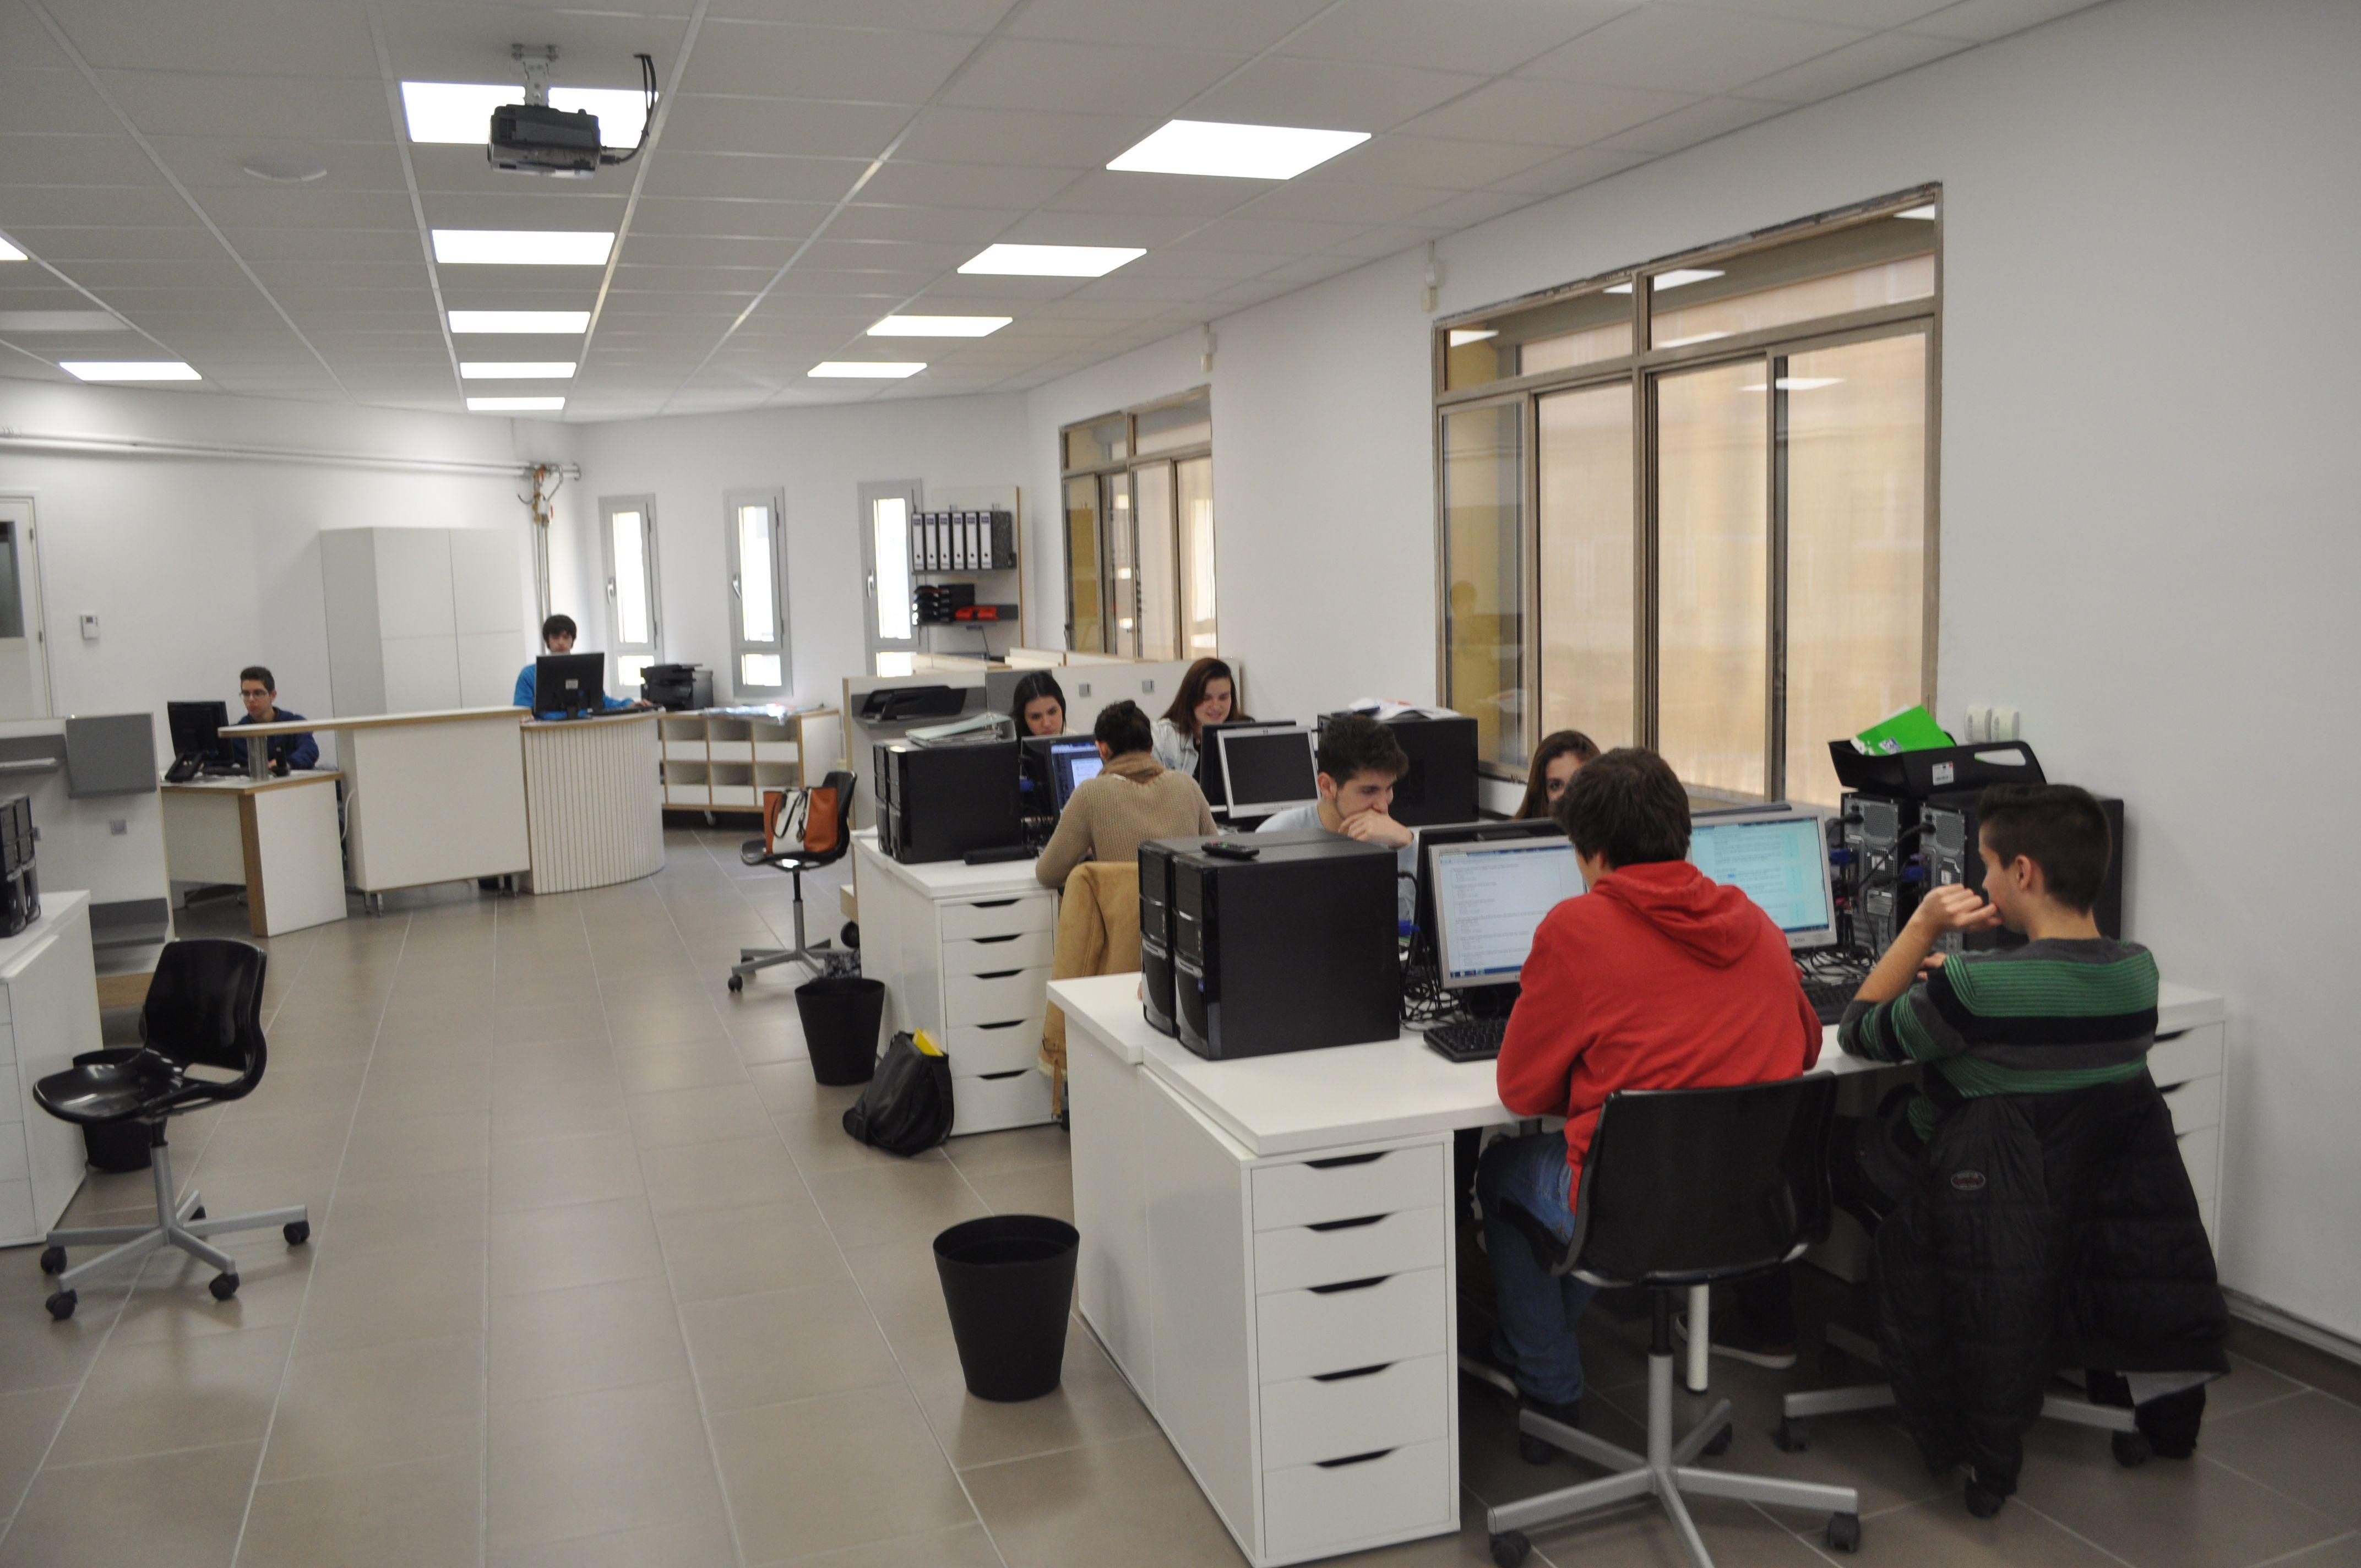 La Salle Girona Formación Profesional La Salle